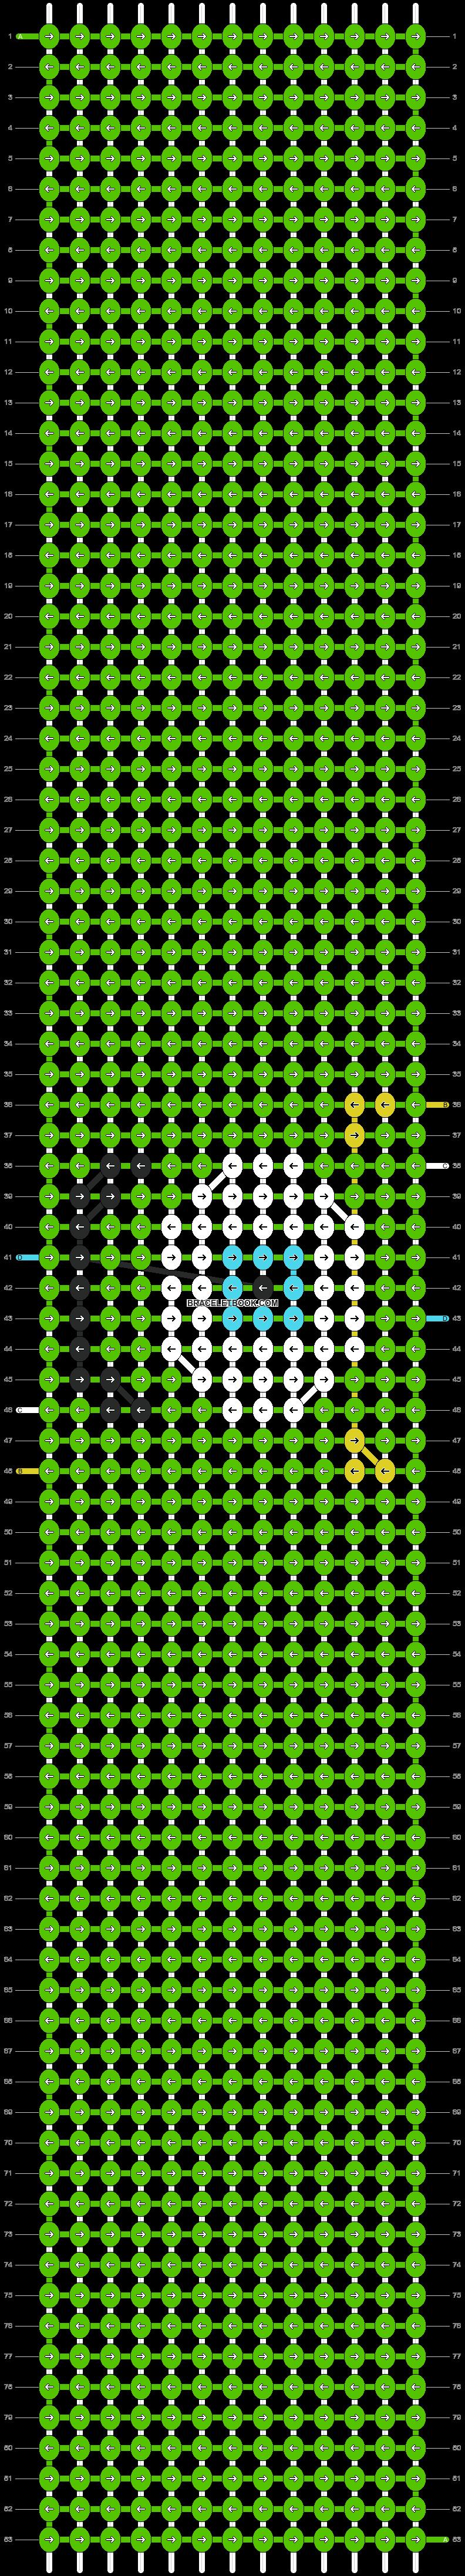 Alpha pattern #14643 pattern